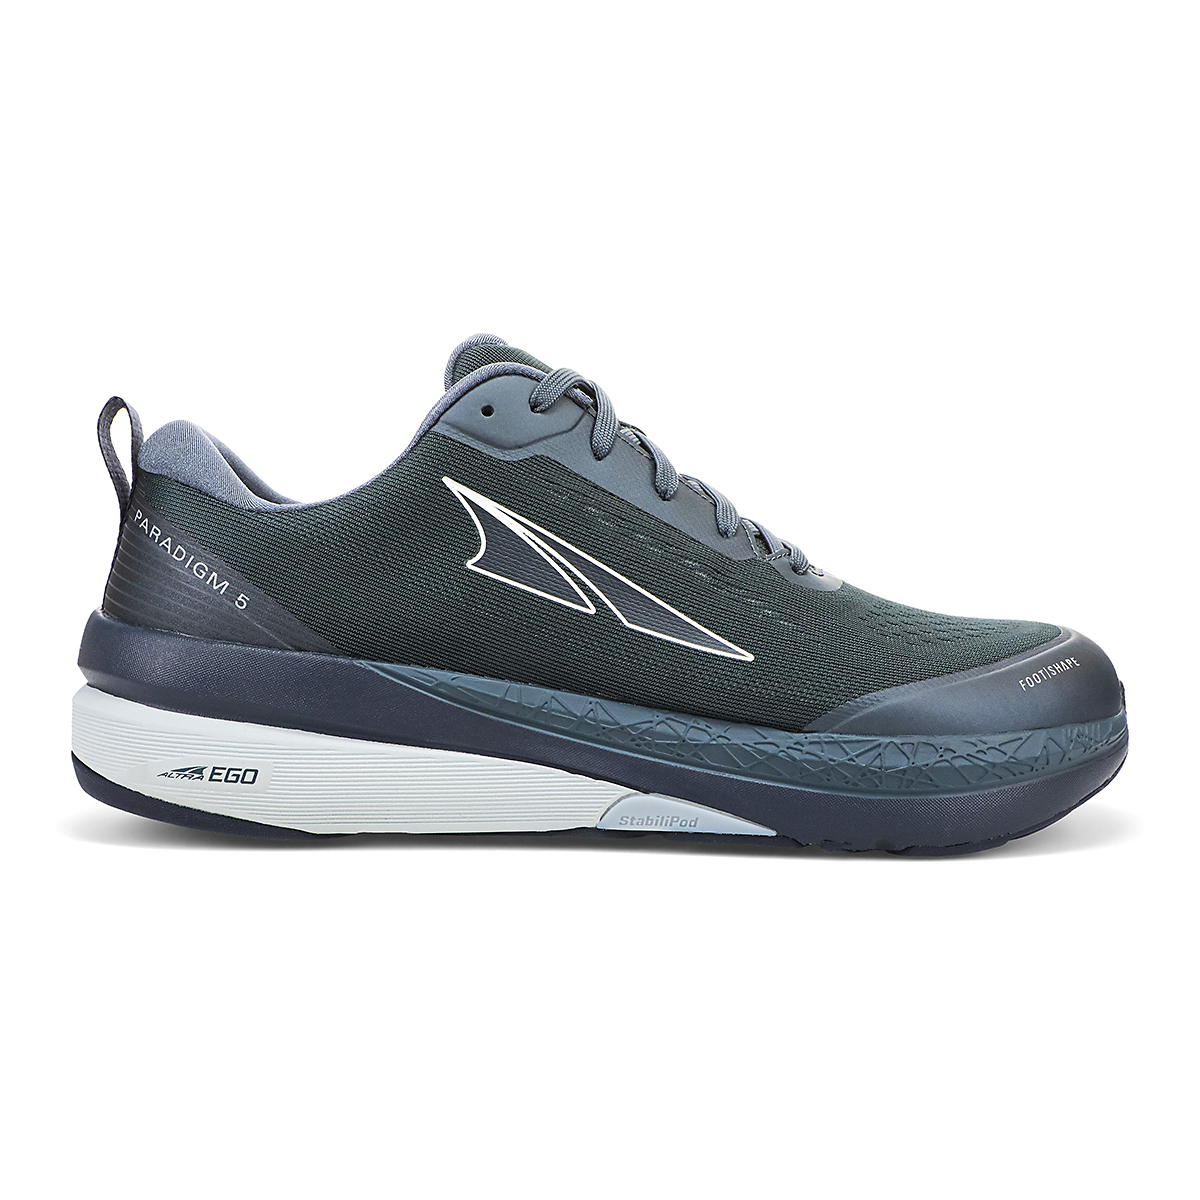 Men's Altra Paradigm 5 Running Shoe - Color: Dark Blue - Size: 7 - Width: Regular, Dark Blue, large, image 1